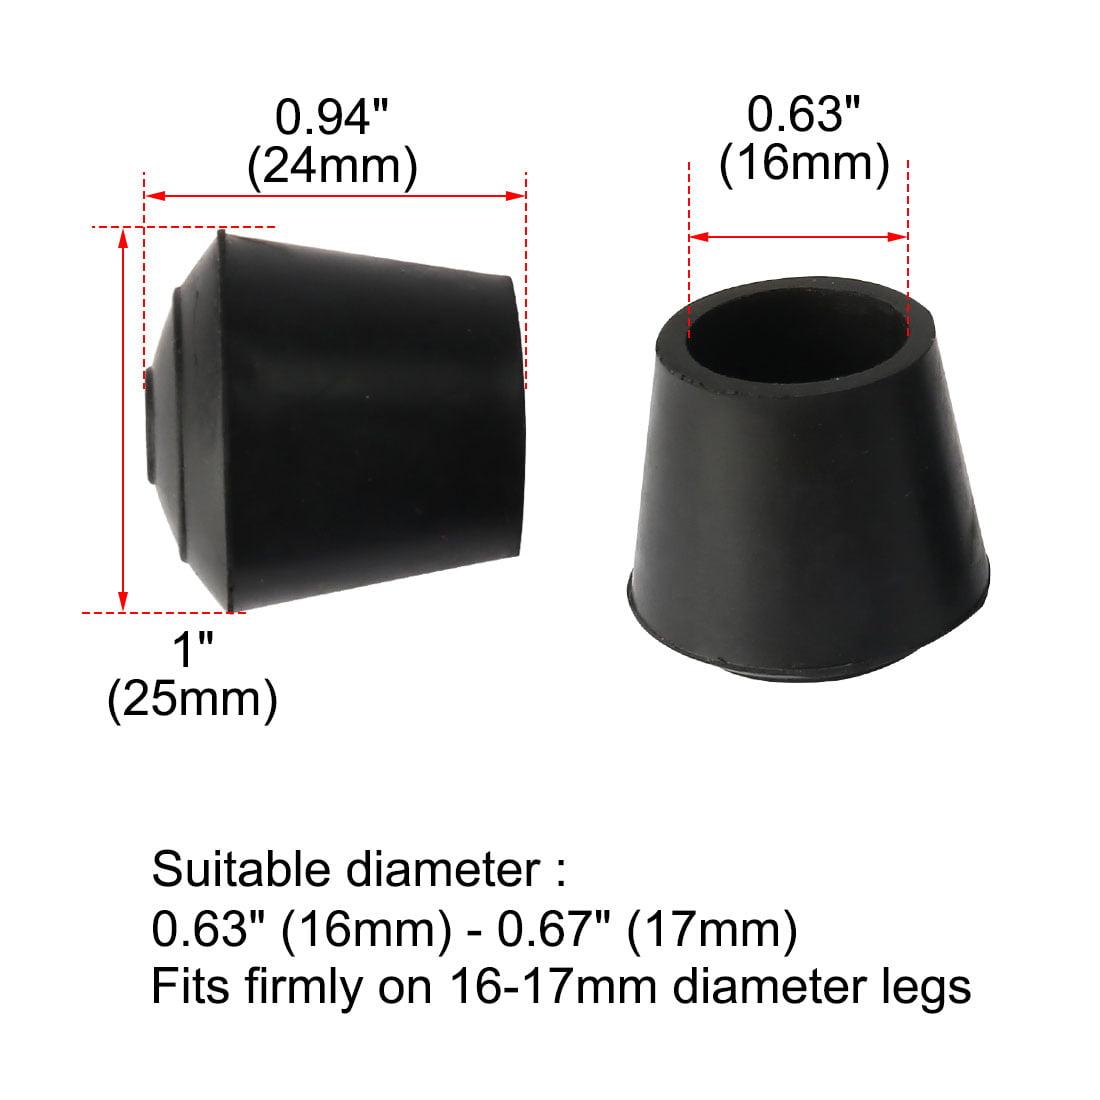 "Rubber Leg Cap Tip Cup Feet Cover 16mm 5/8"" Inner Dia 15pcs for Furniture Table - image 2 de 7"